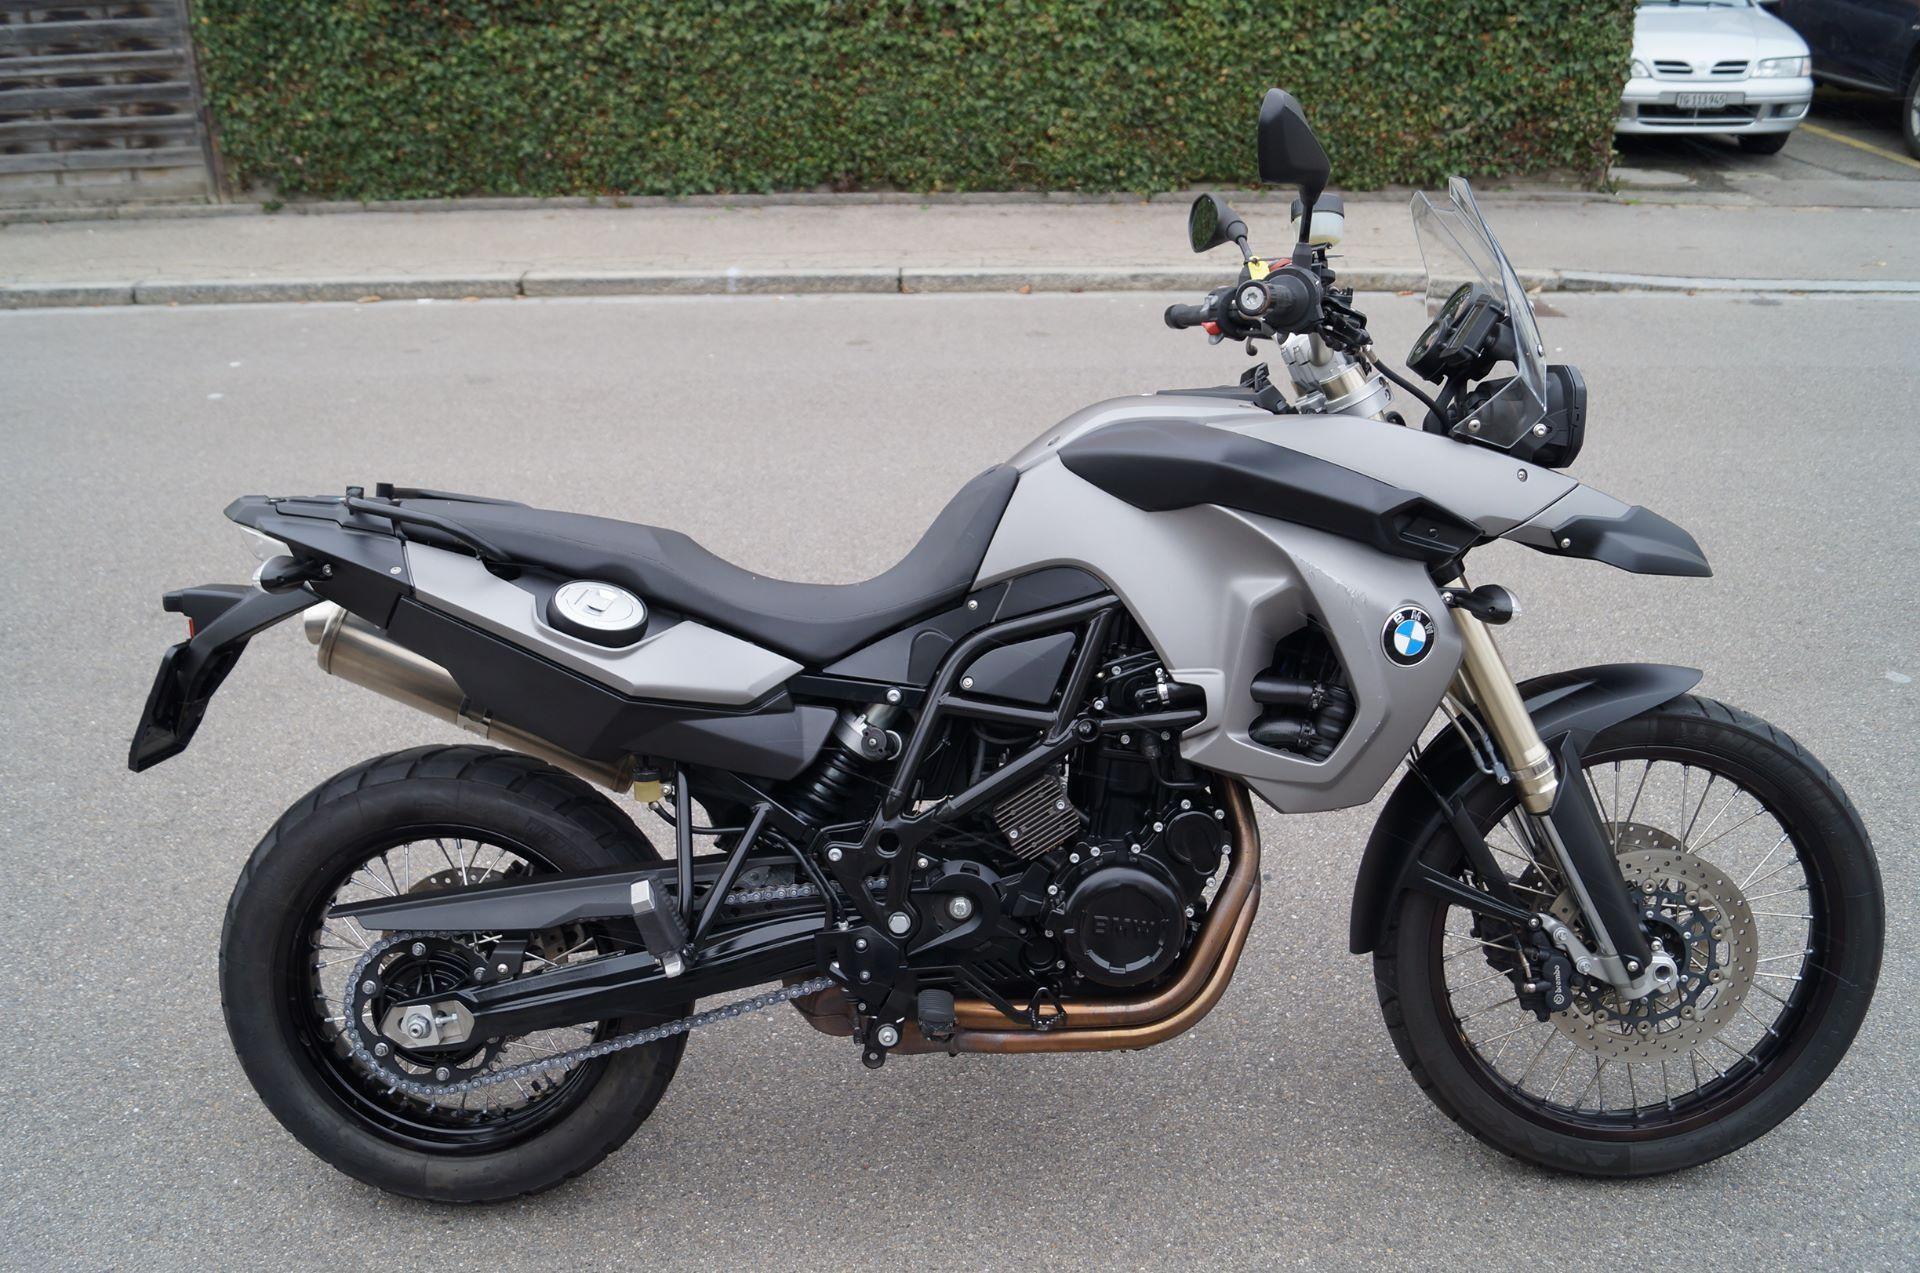 moto occasions acheter bmw f 800 gs abs scherrer motos ag steckborn. Black Bedroom Furniture Sets. Home Design Ideas